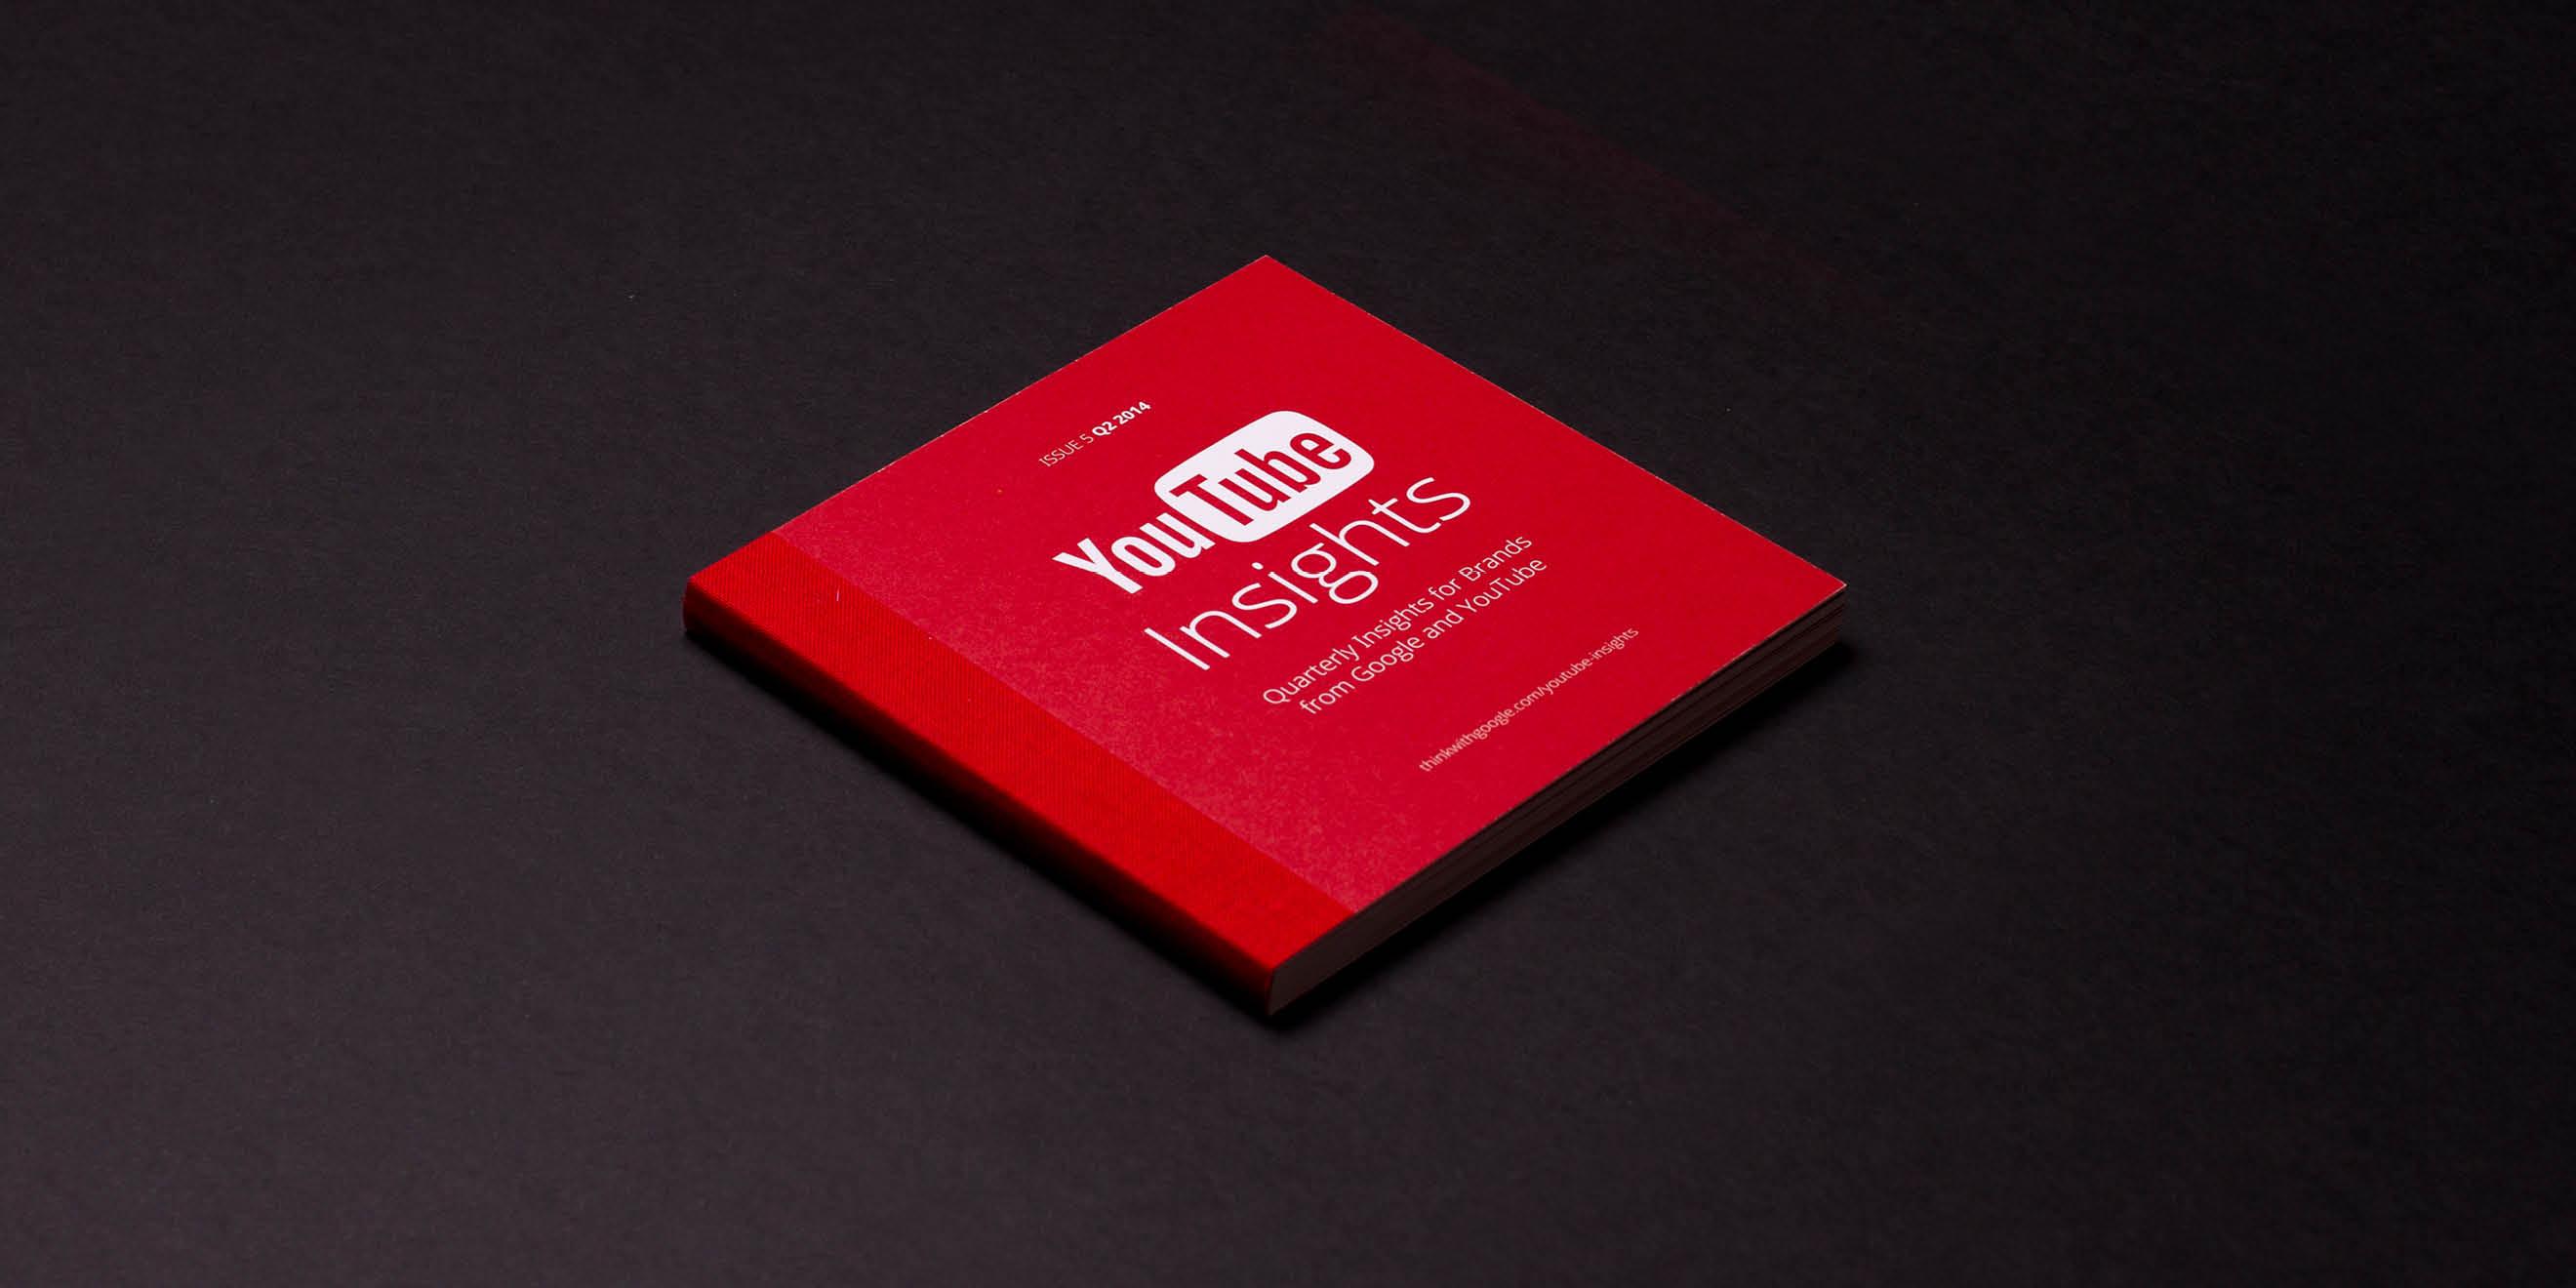 youtuberesearchcommunications1.jpg